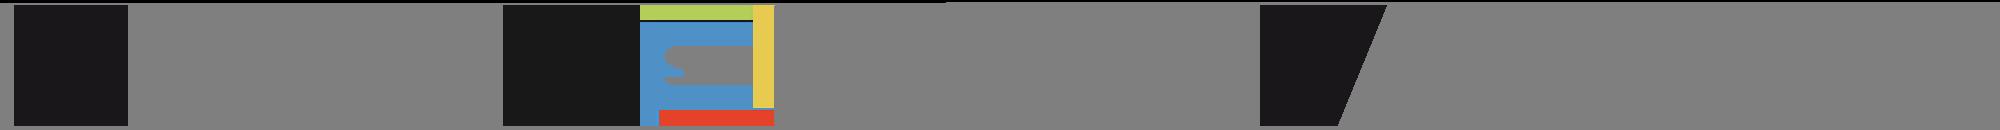 slideshow-dmp-logo